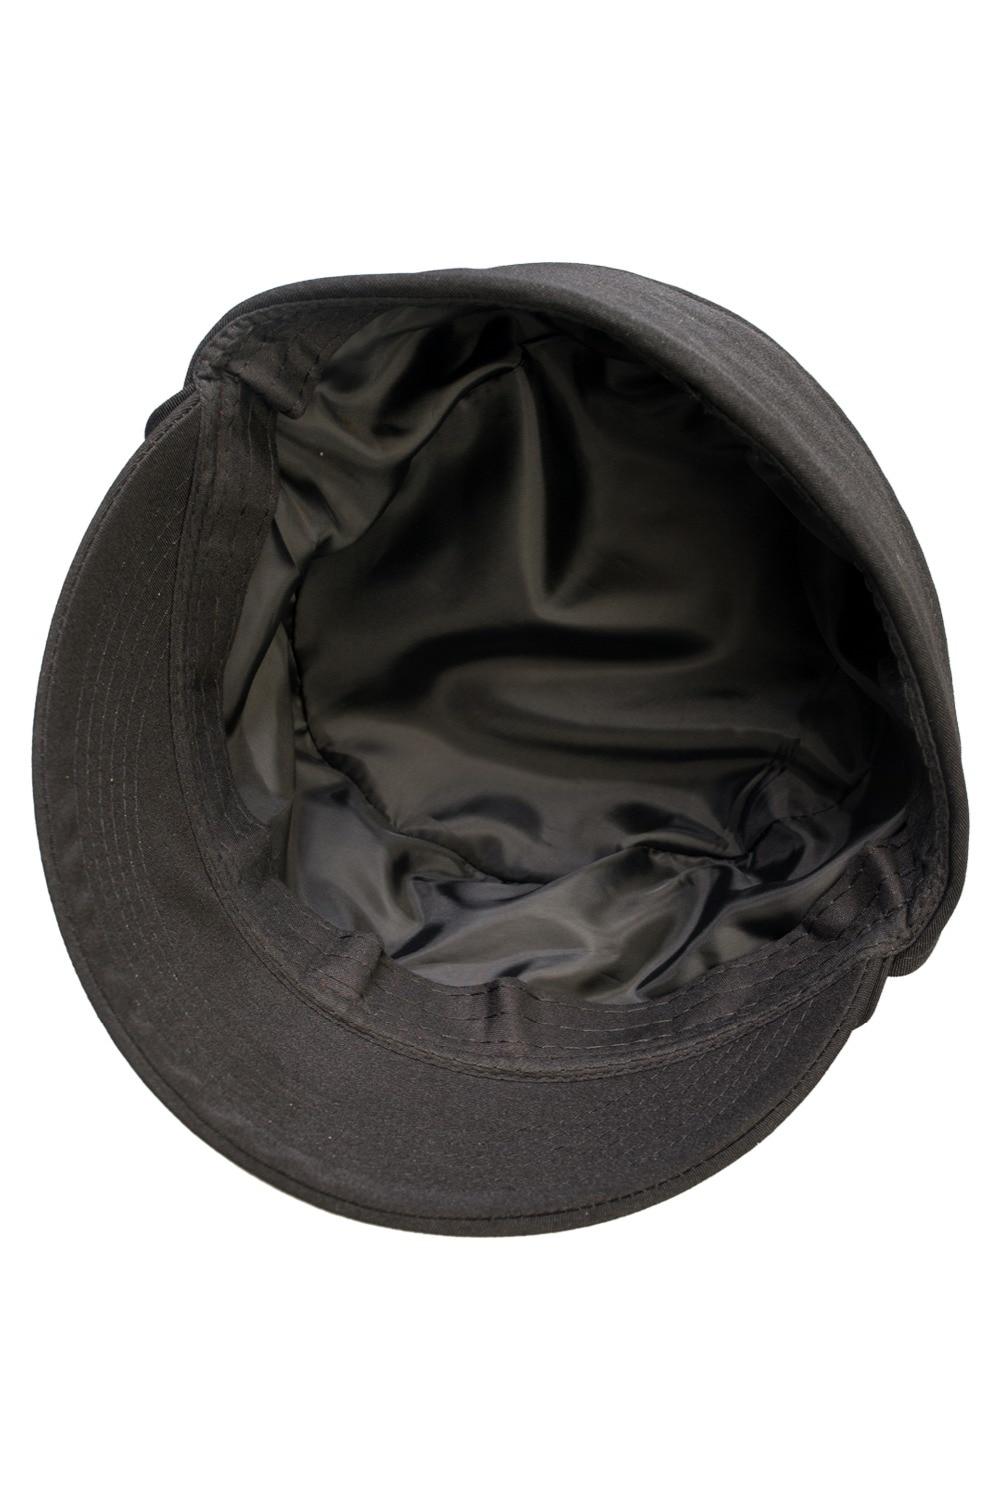 1PCS Star Wars Imperial Naval//Trooper Officer Cosplay Black Grey Green Hat Cap